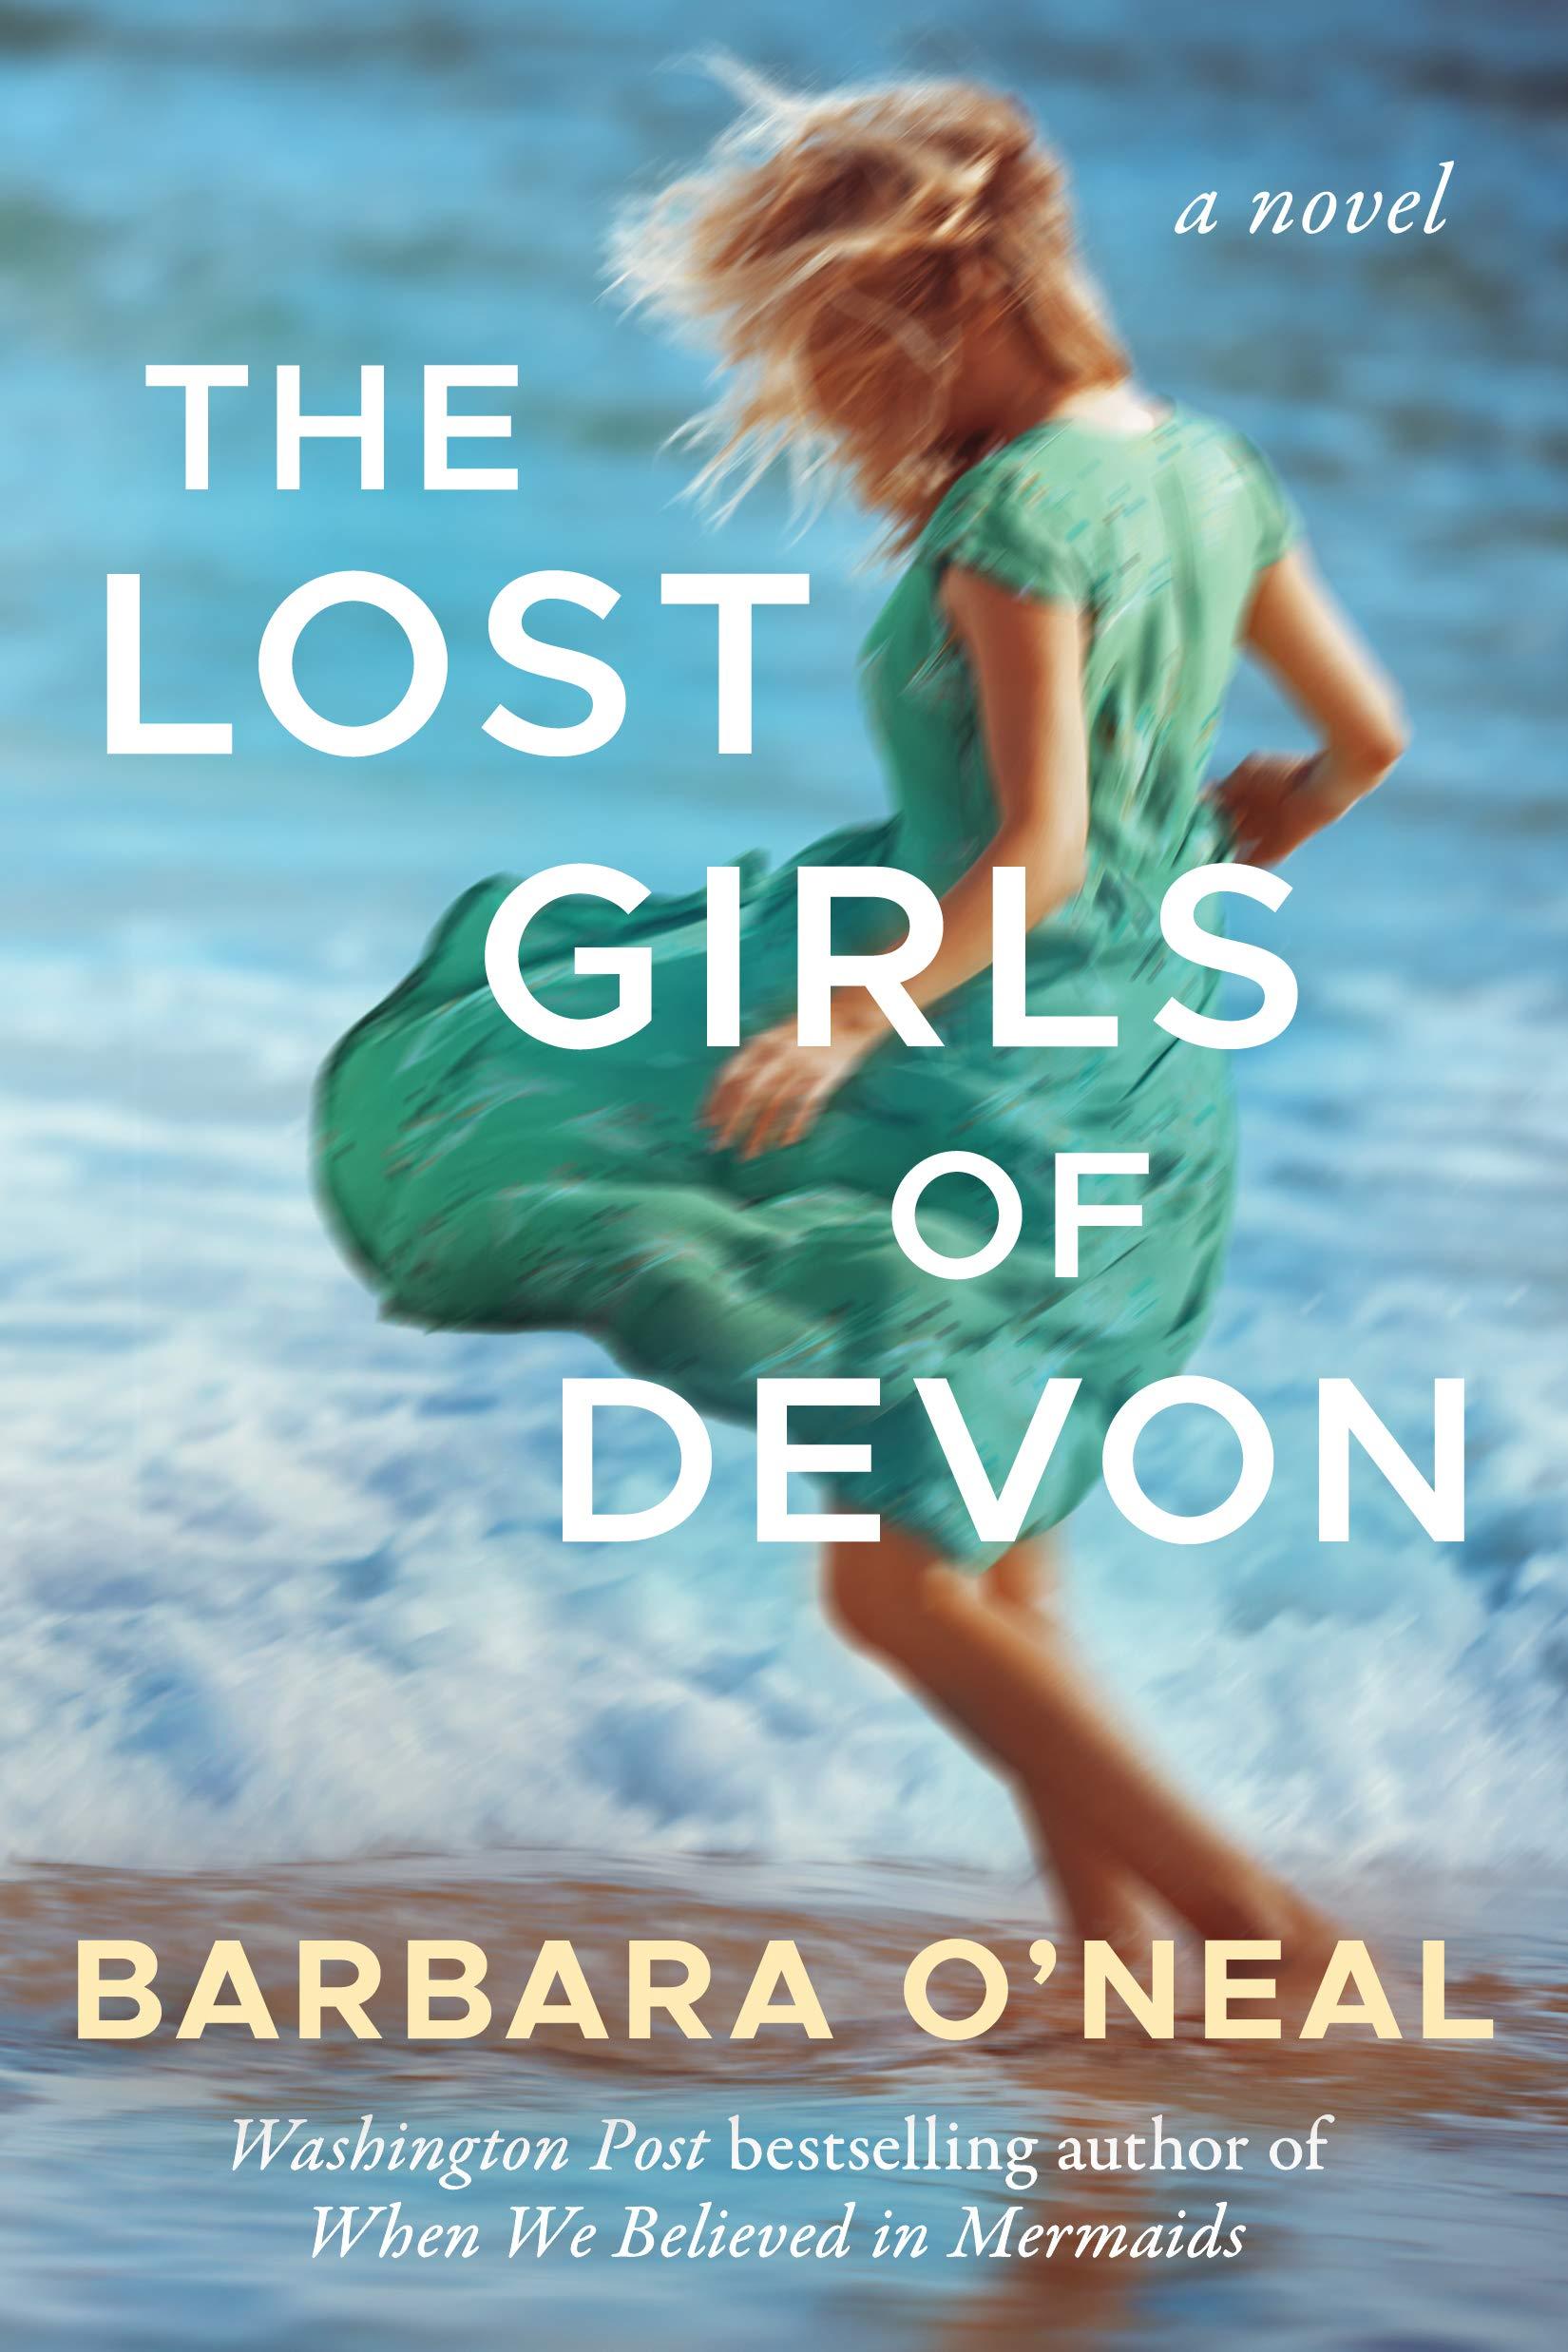 The Lost Girls of Devon eBook: O'Neal, Barbara: Amazon.co.uk: Kindle Store